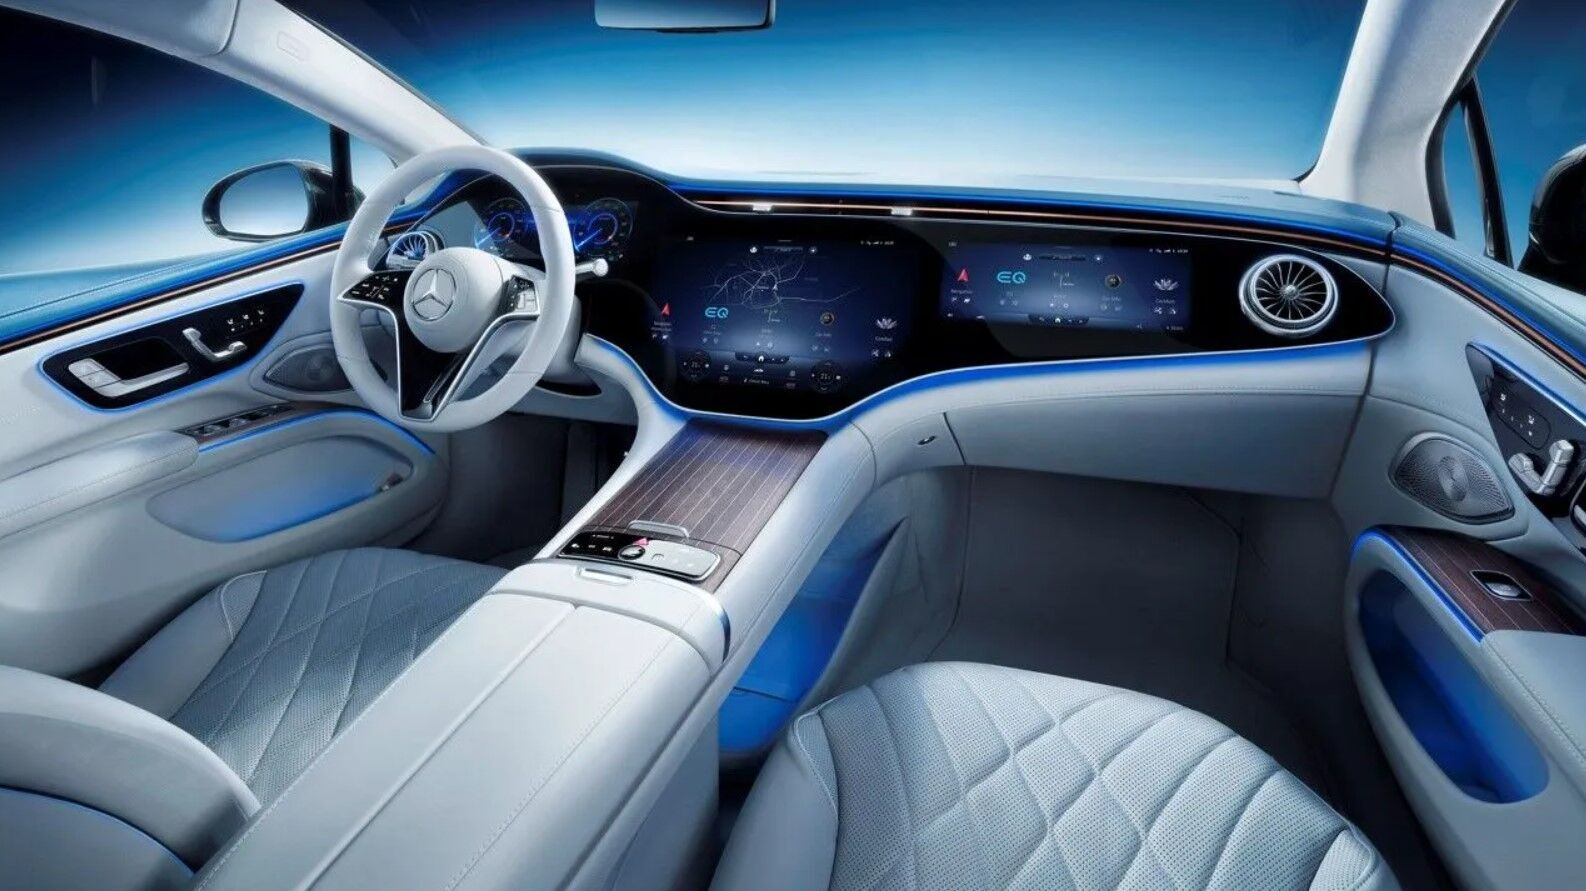 Внутри Mercedes EQS выглядит технологично